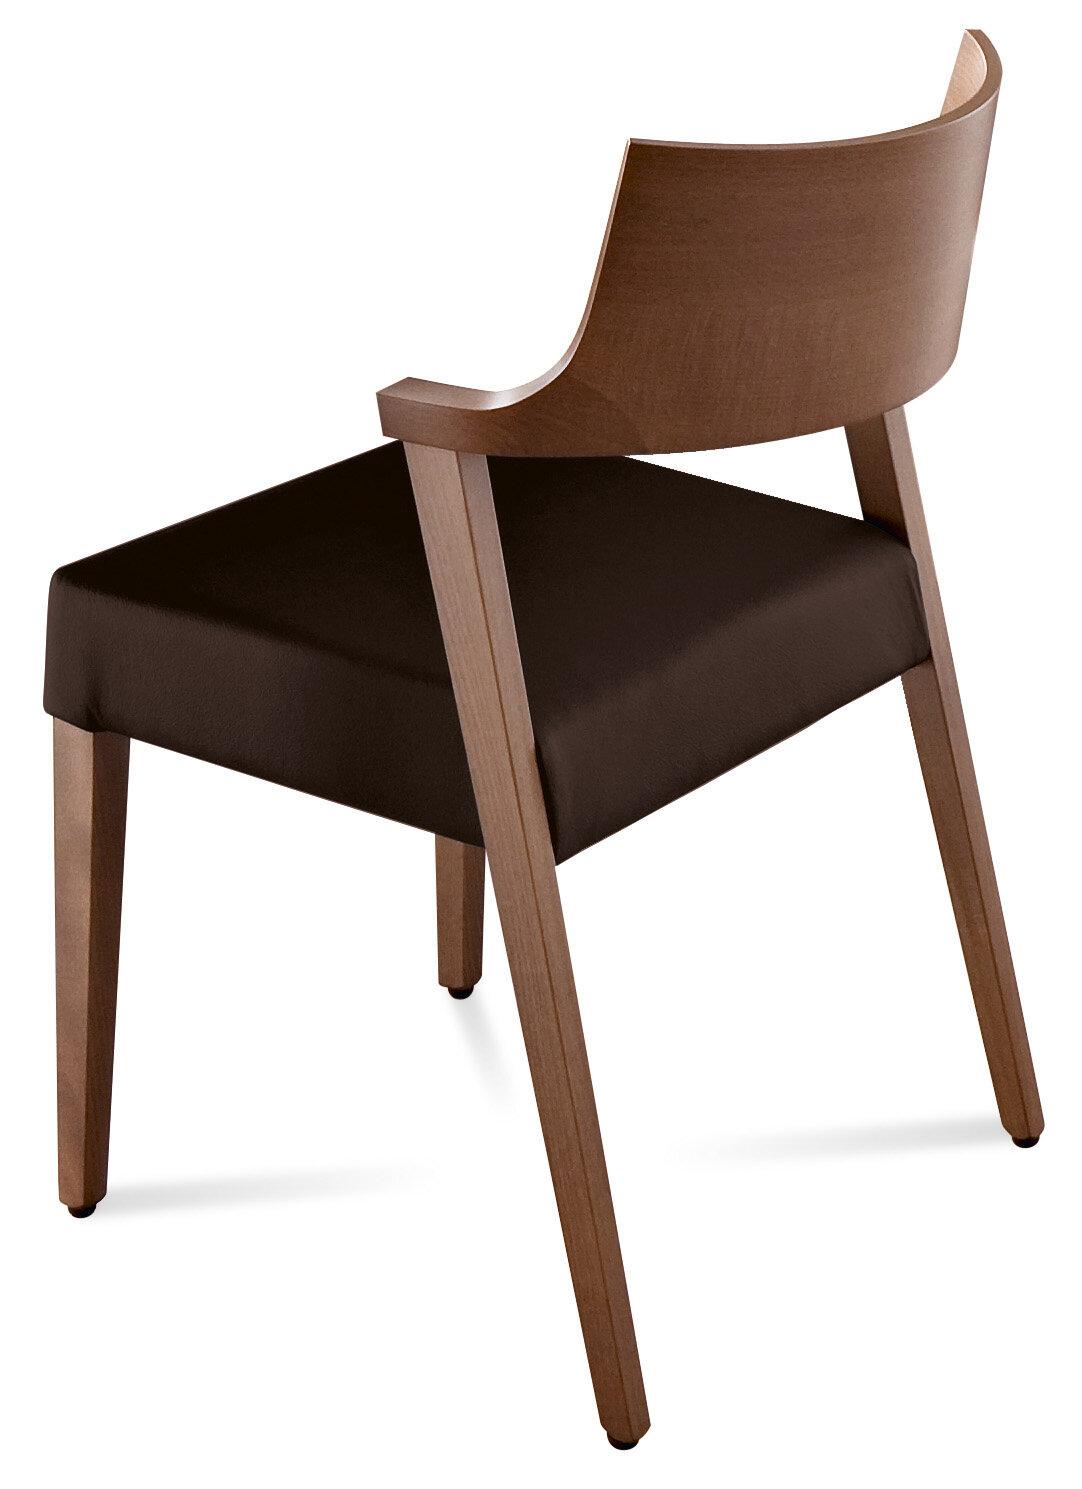 Domitalia lirica genuine leather upholstered dining chair reviews wayfair